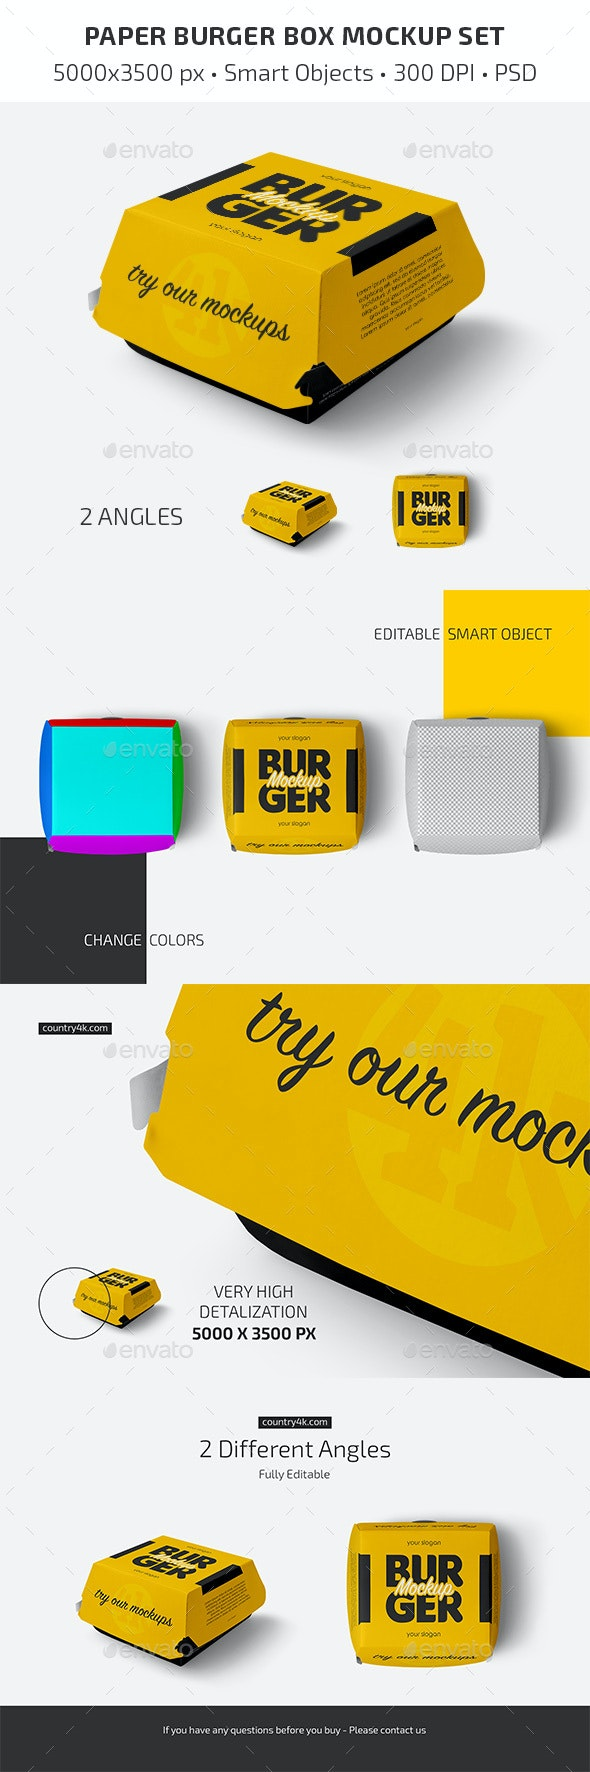 Paper Burger Box Mockup Set - Food and Drink Packaging